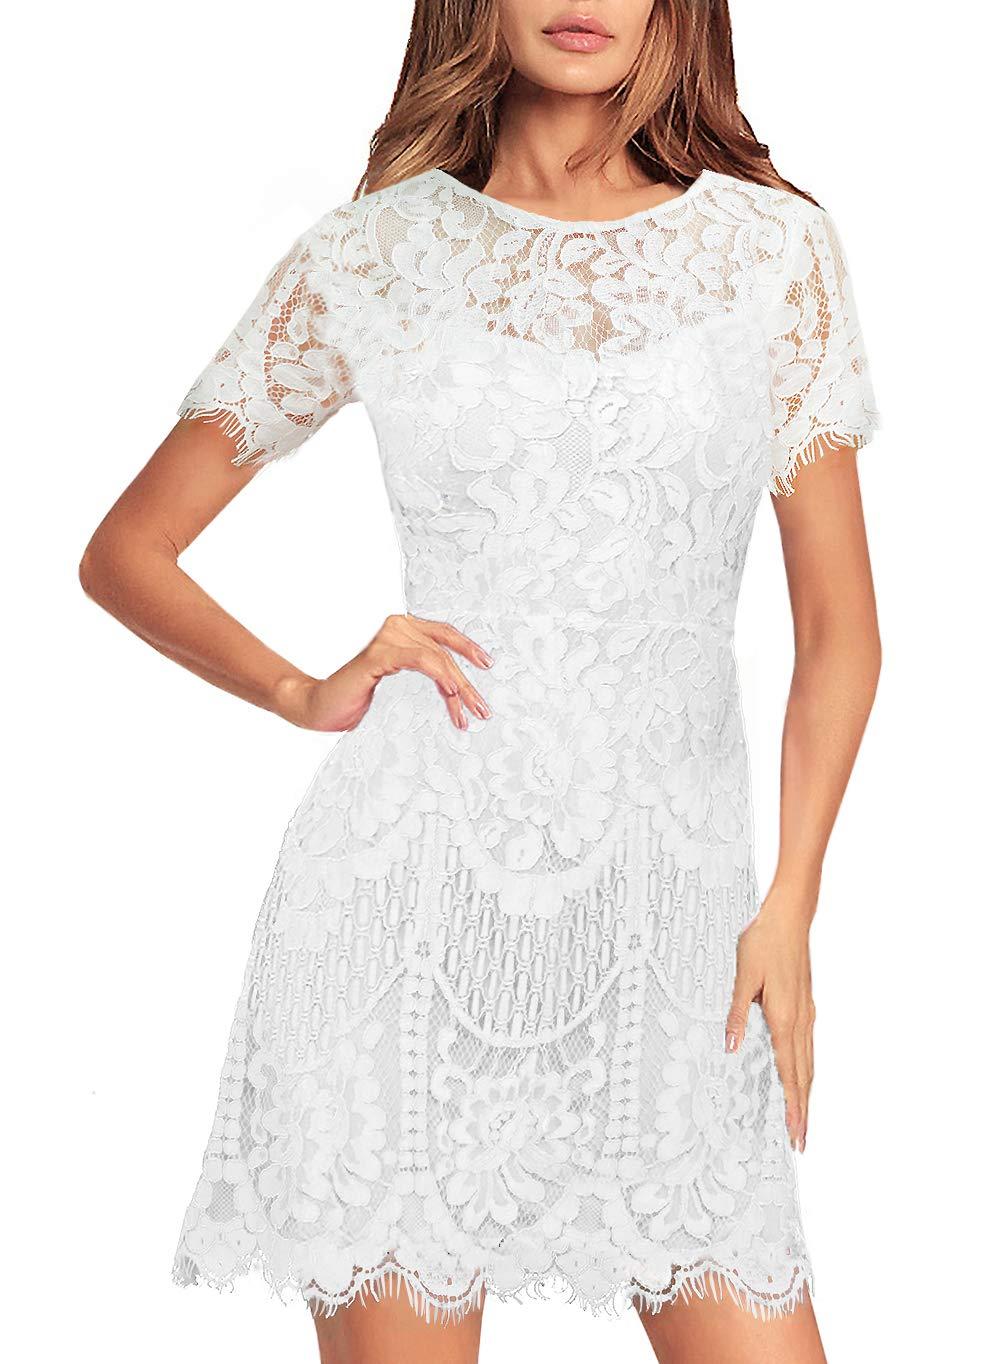 White Dress - Womens Dresses Elegant Ruffles Cap Sleeves Summer A-Line Midi Dress